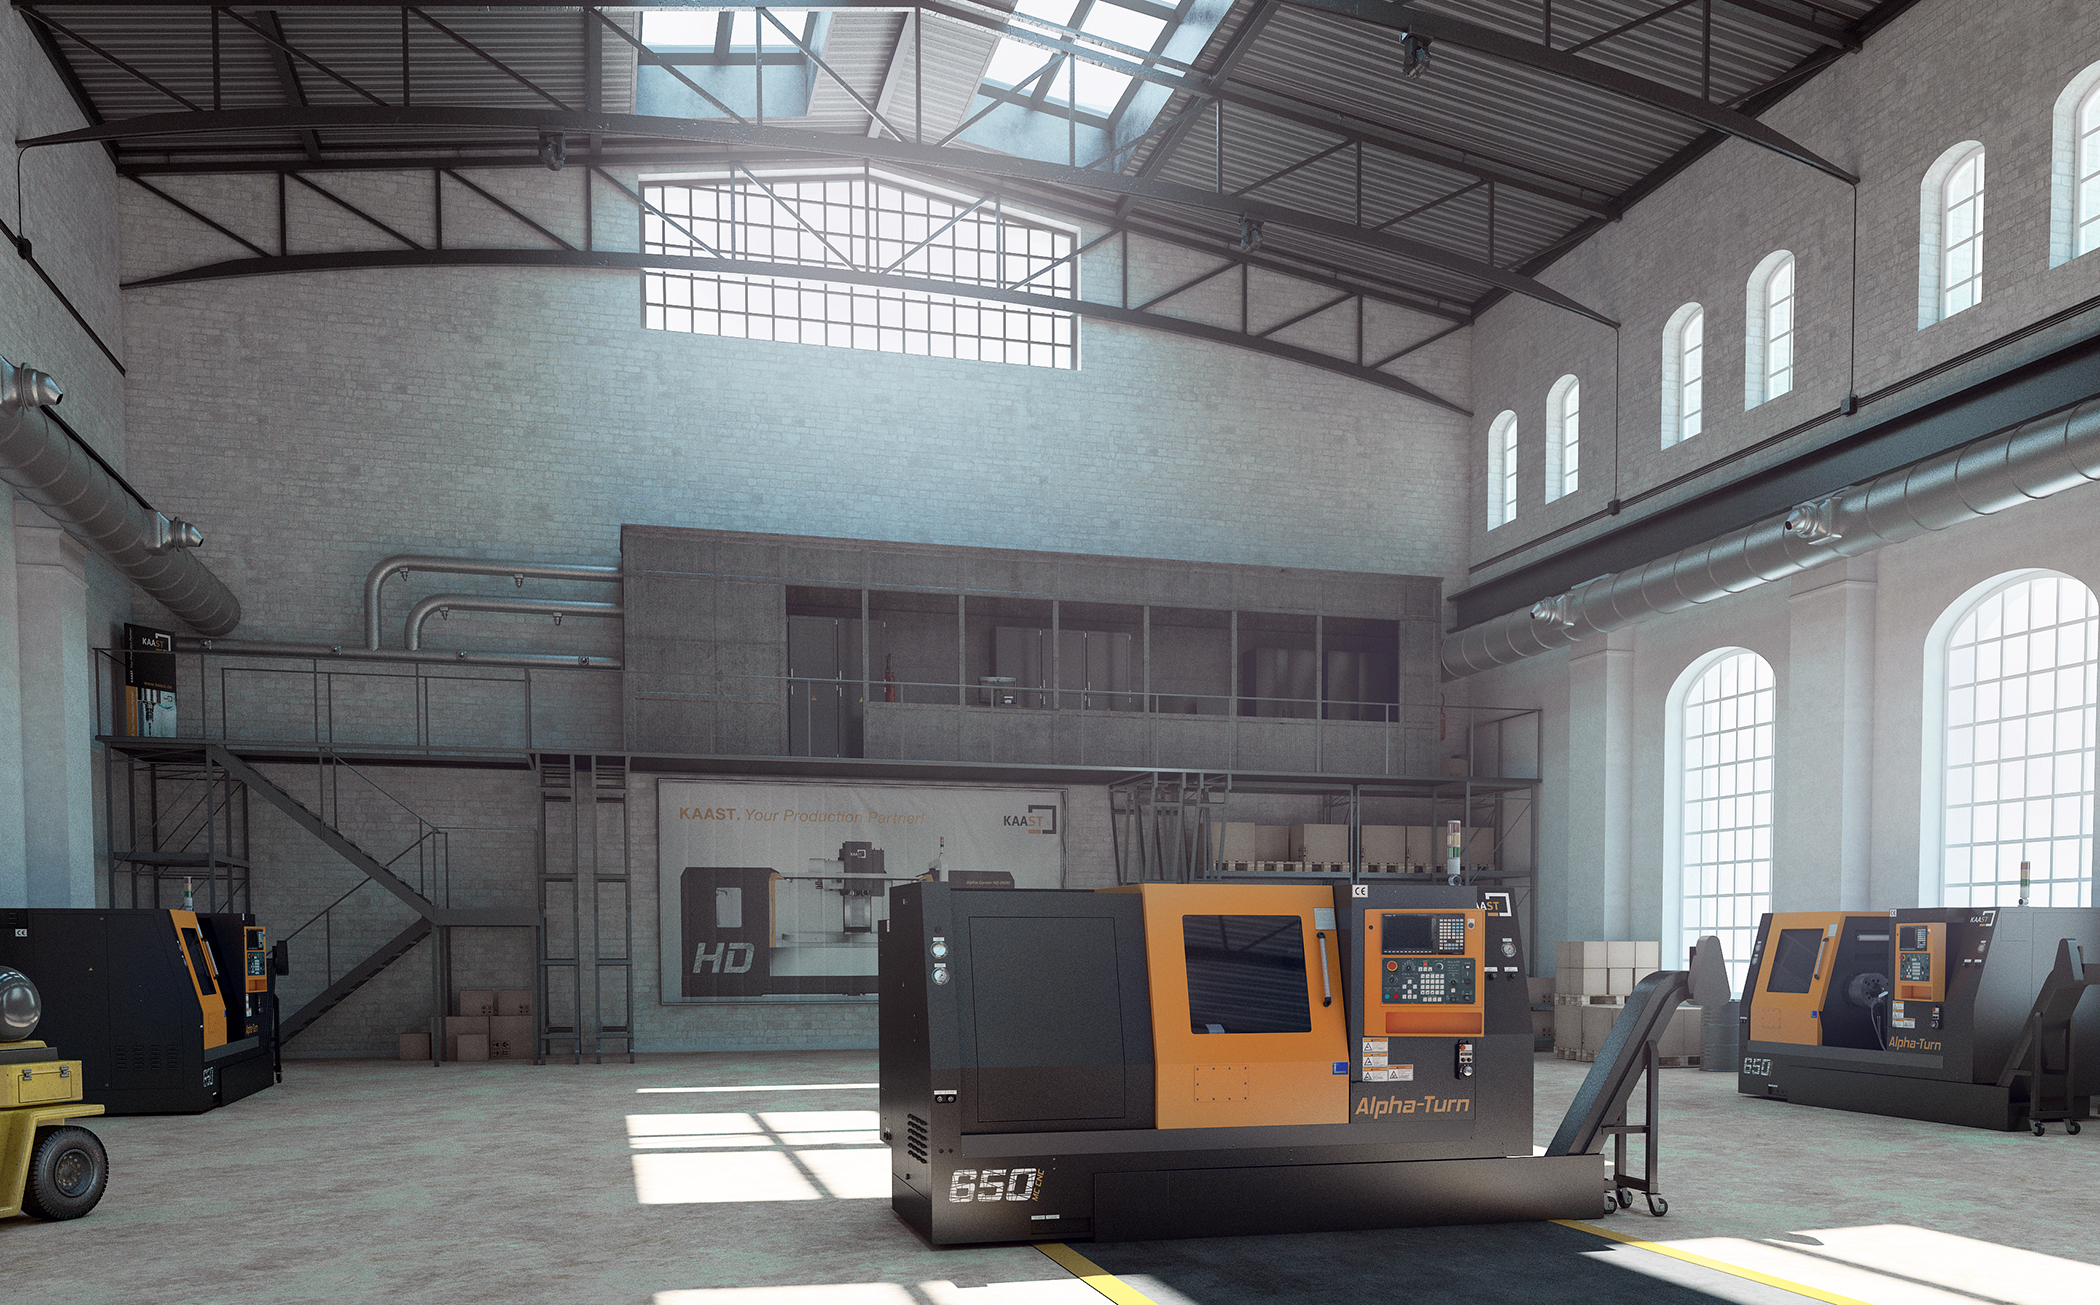 Ploter CNC 3d visualization